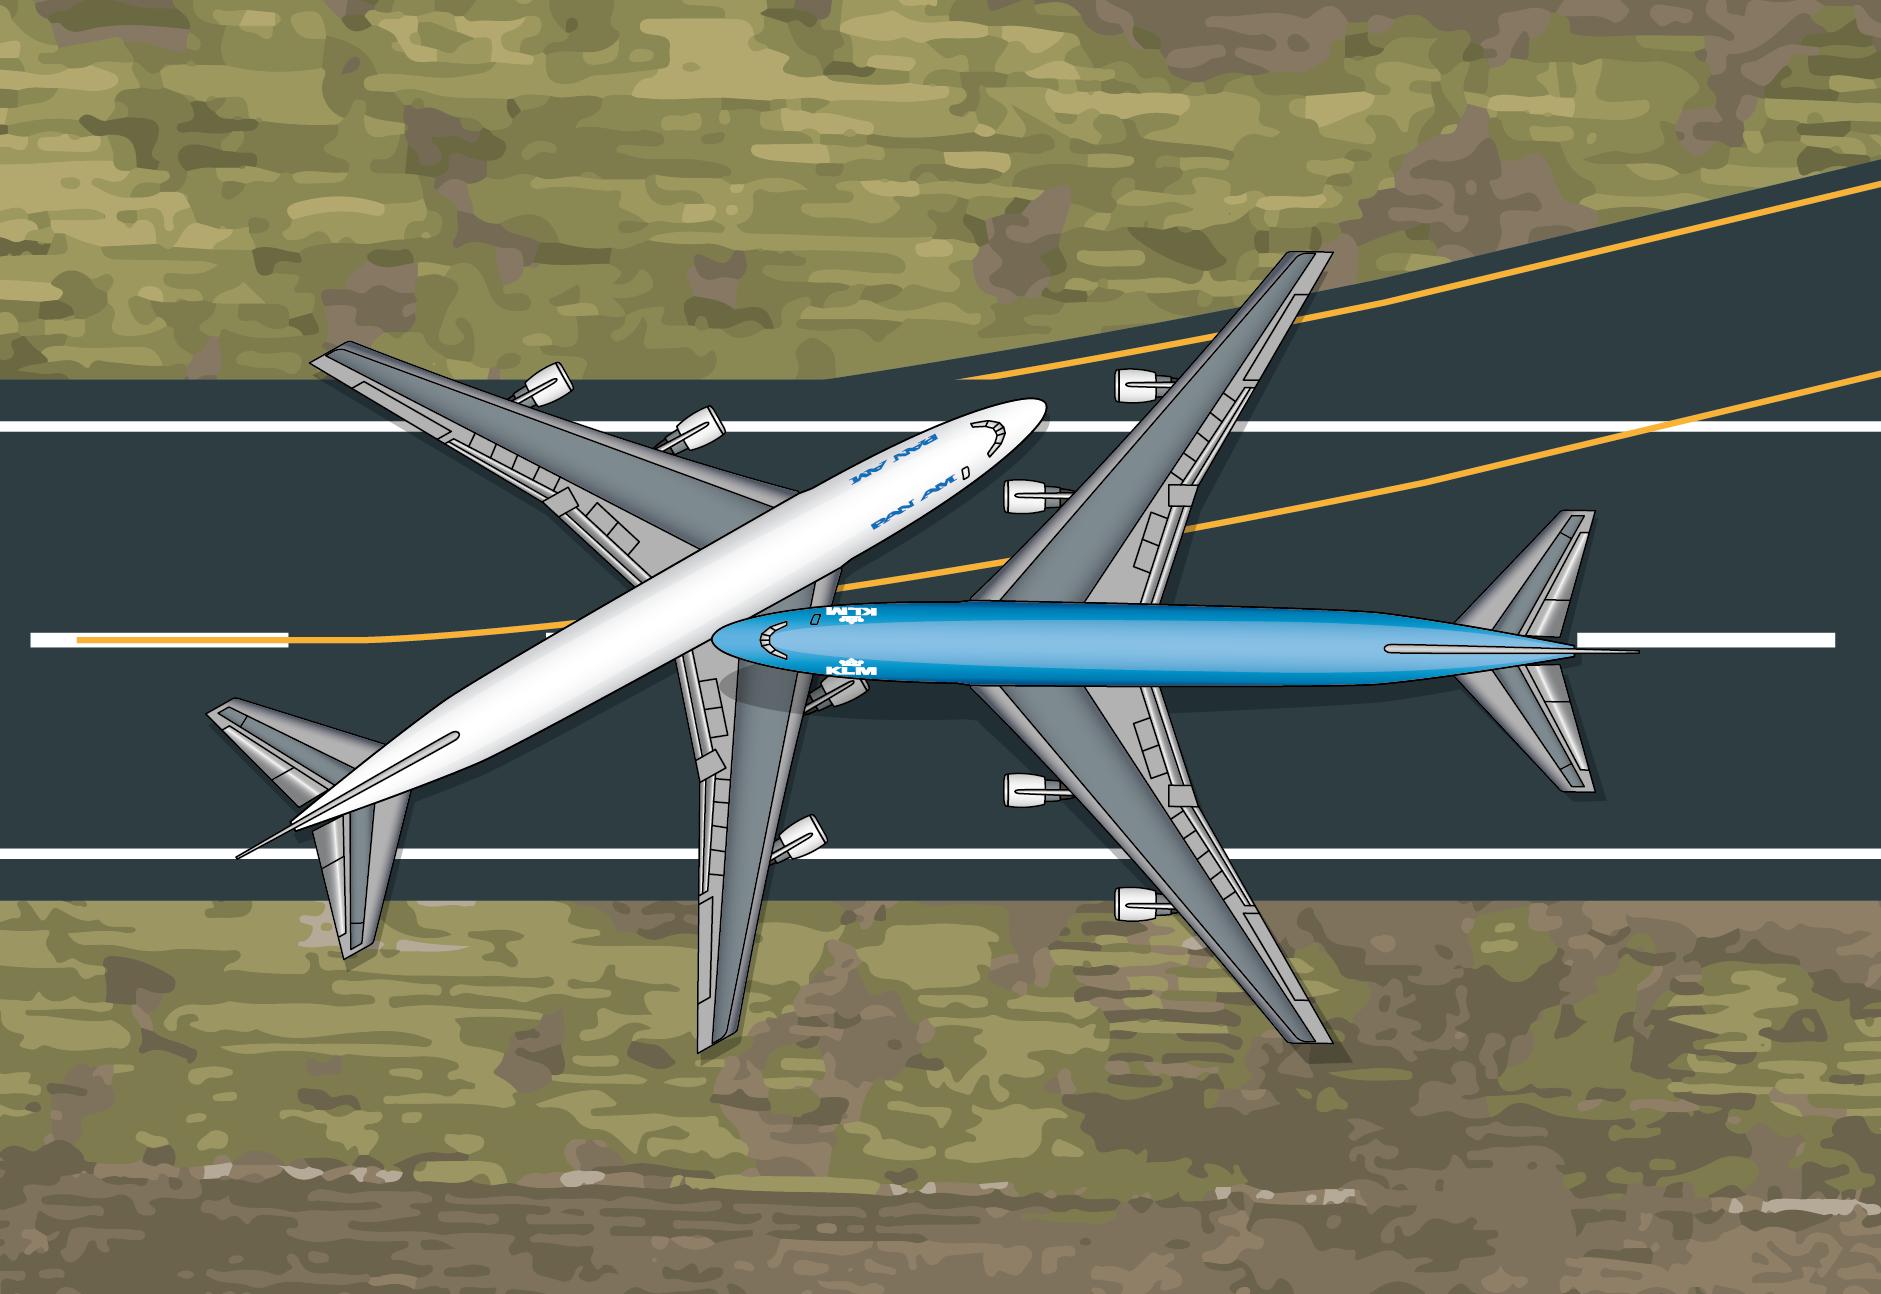 7 Kecelakaan pesawat terbesar sepanjang sejarah manusia